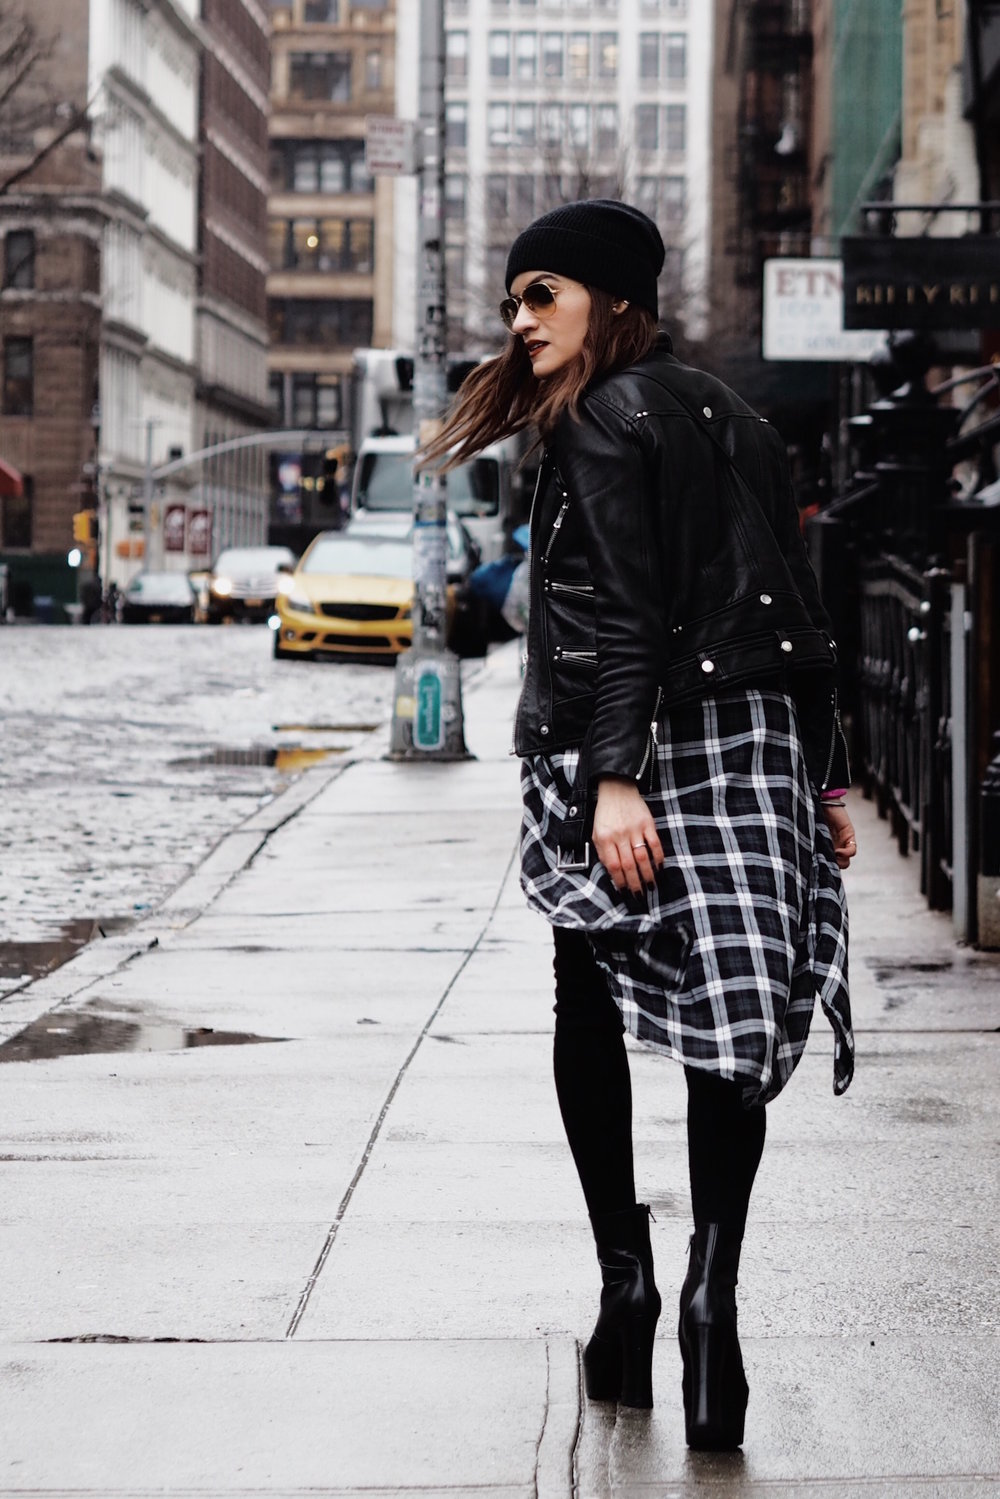 NYC street style Saint laurent platform boots-18.jpg